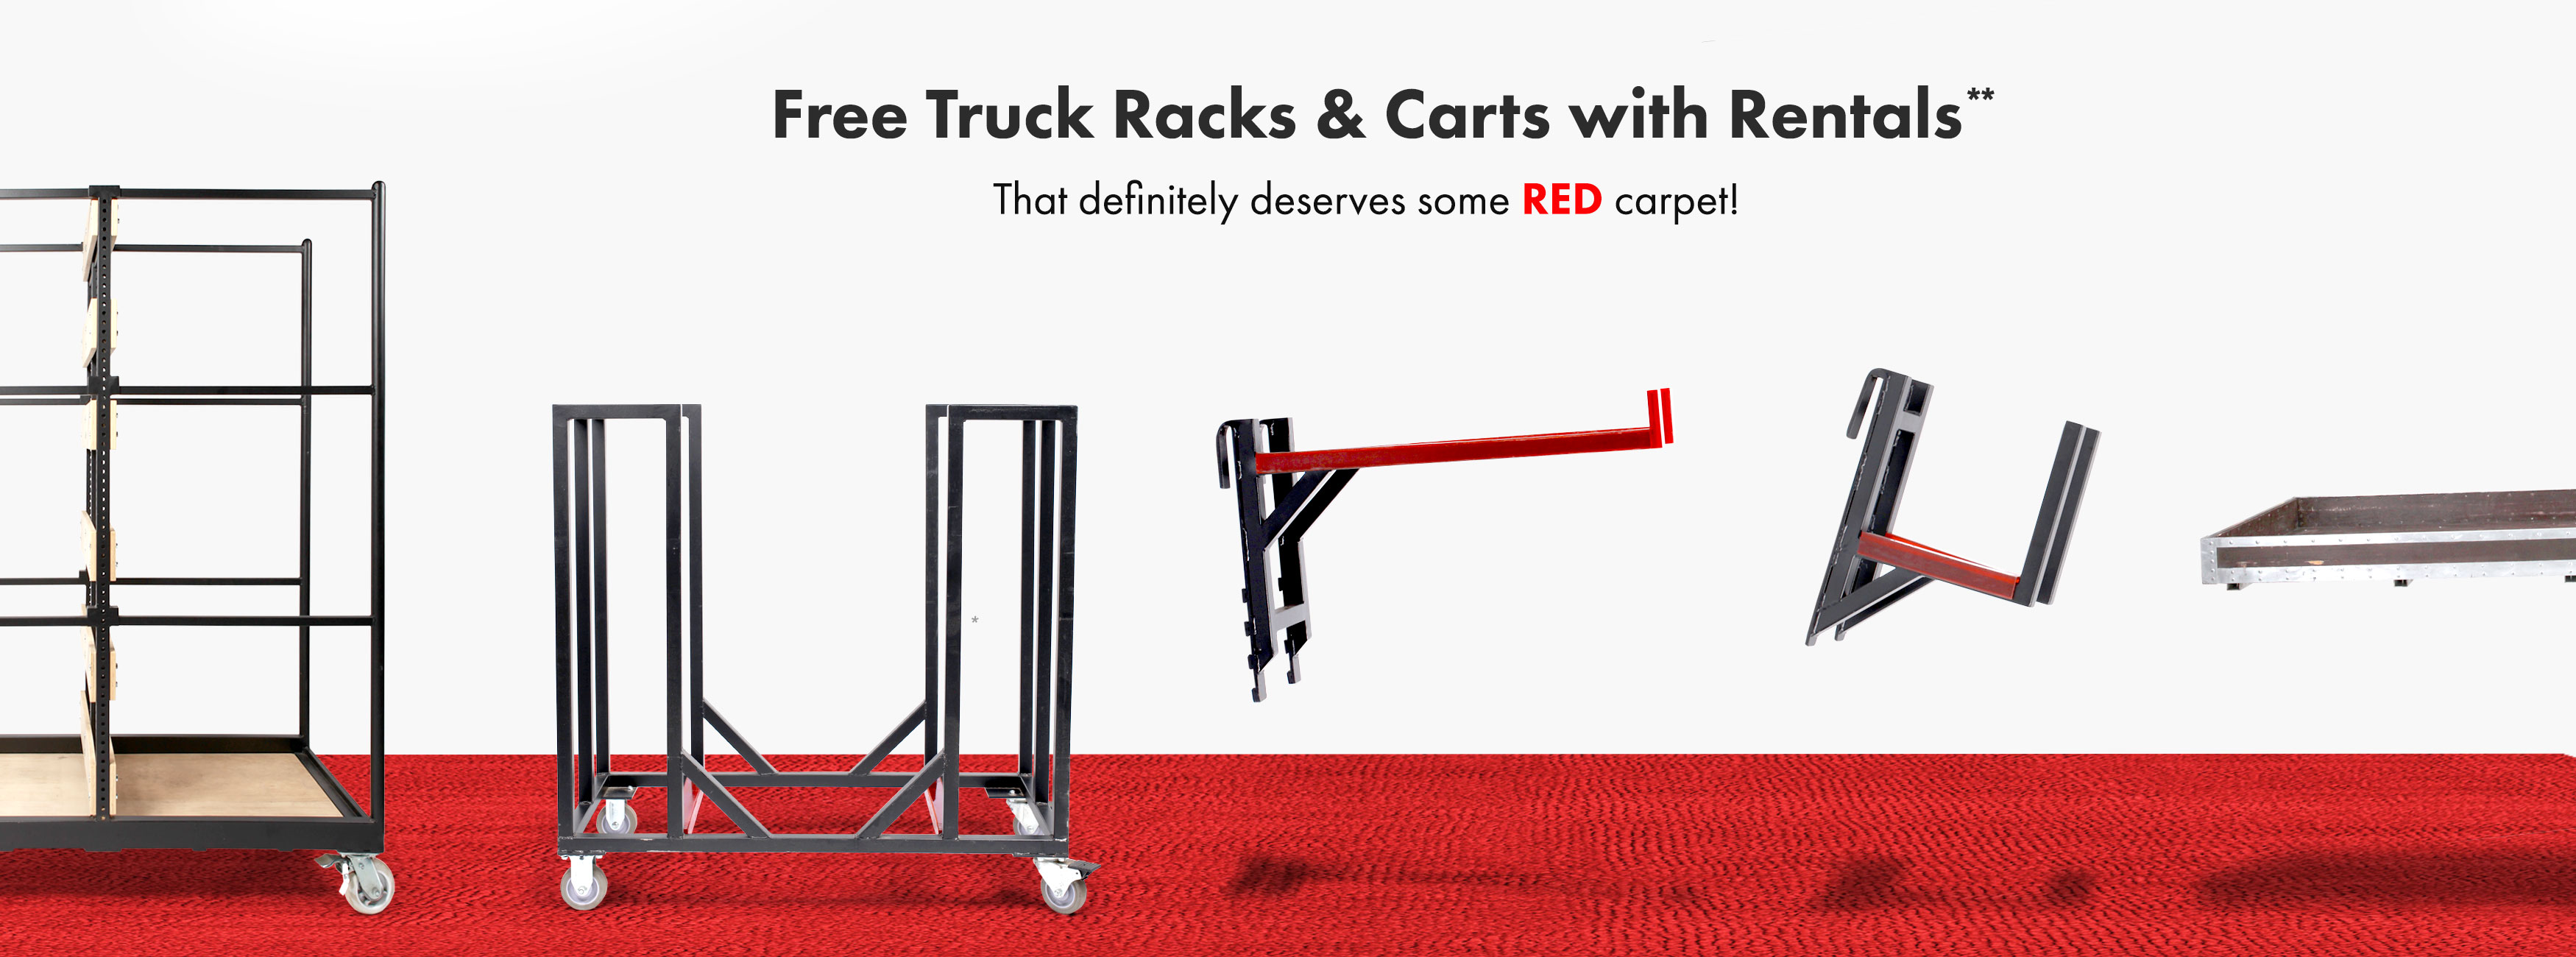 free racks and carts*